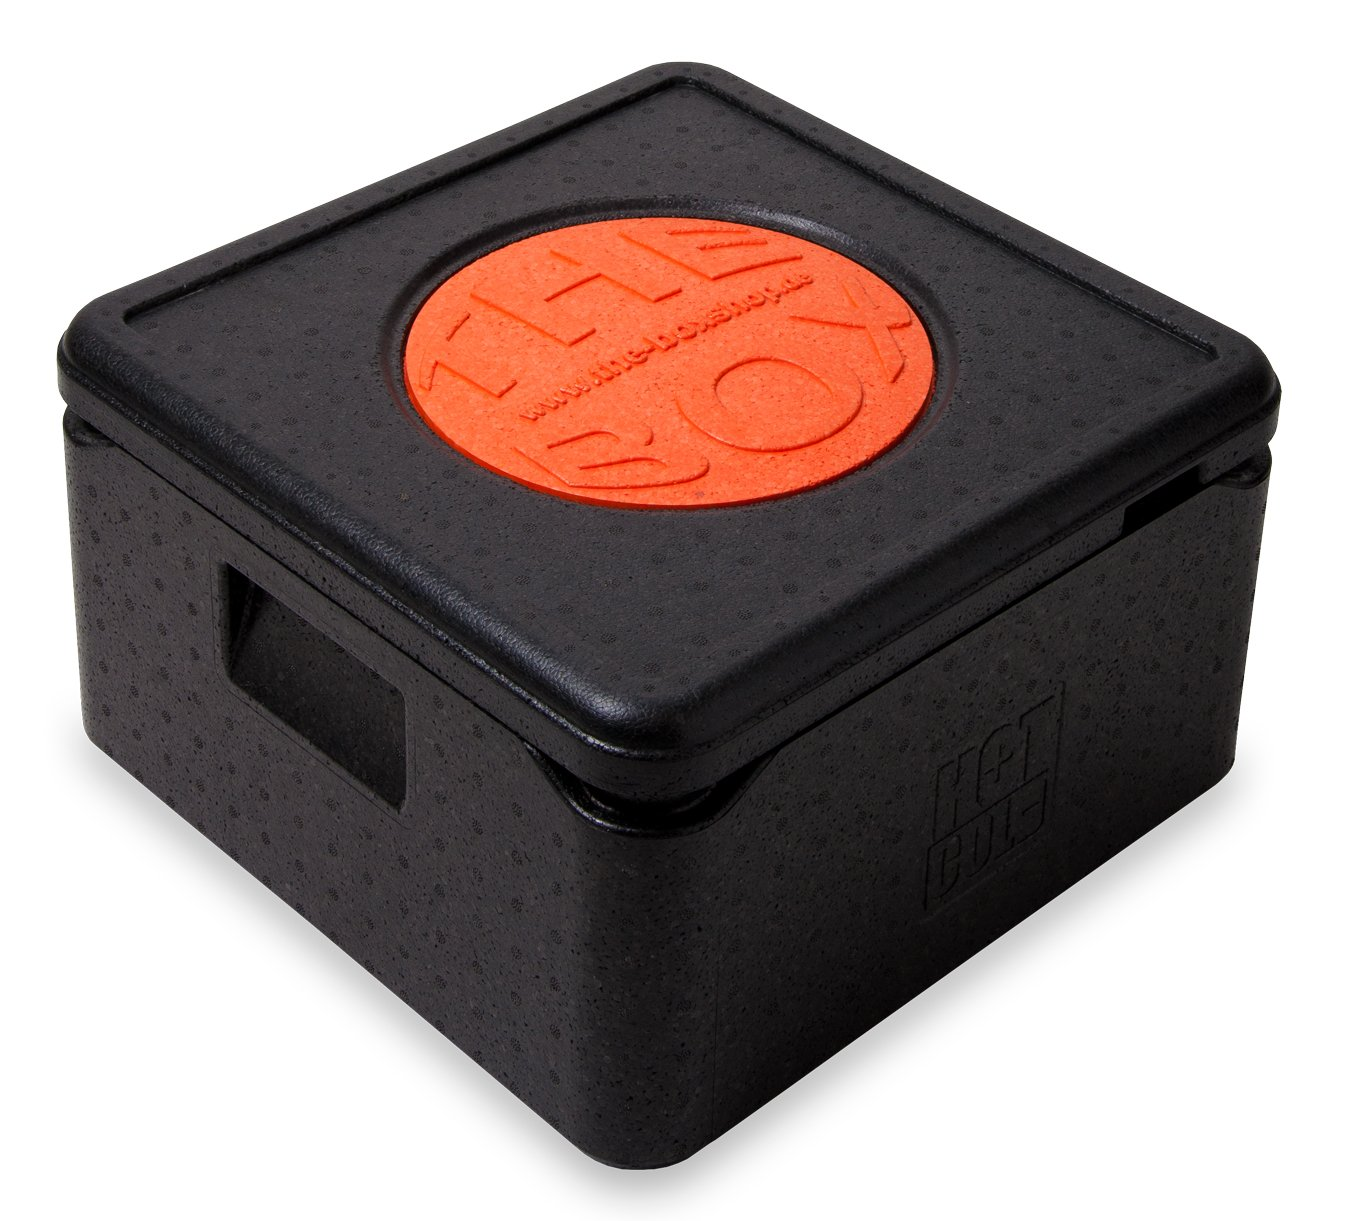 *6er Paket* - THE BOX Thermobox Pizza mittel 79771; schwarz, Außenmaß 41 x 41 x 24 cm, Innenmaß 35 x 35 x 17,5 cm, Nutzhöhe 17,5 cm, 21 l.